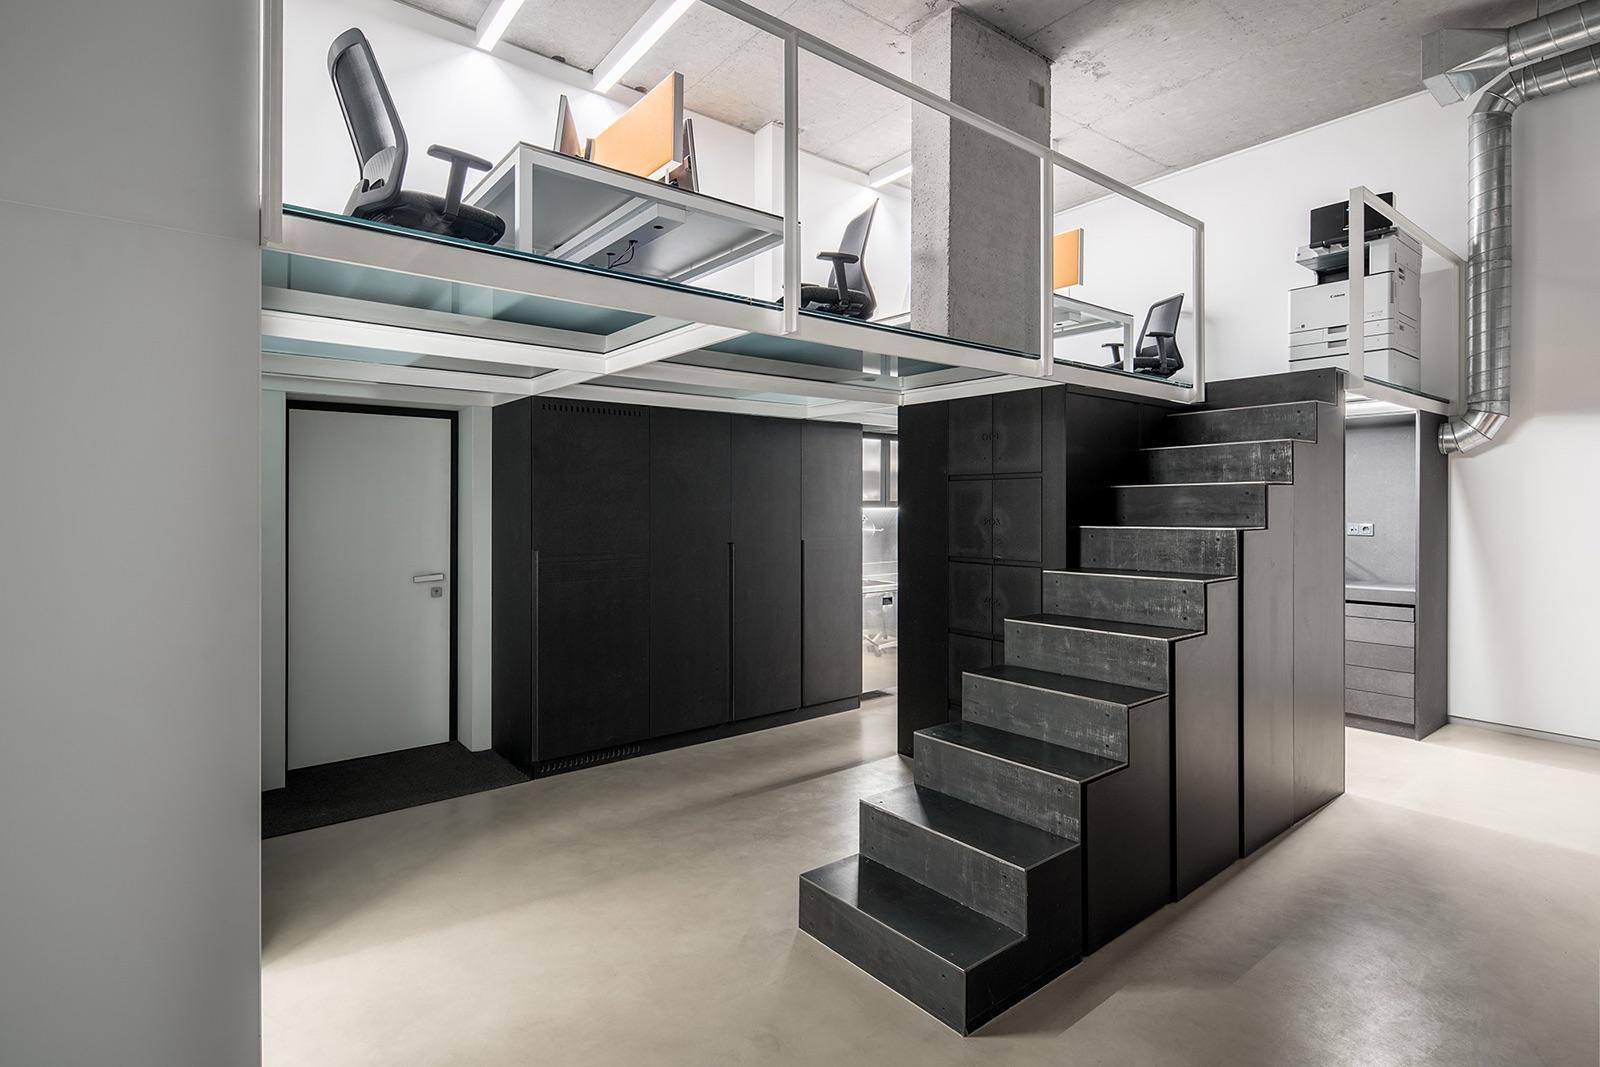 yod-design-lab-office-13